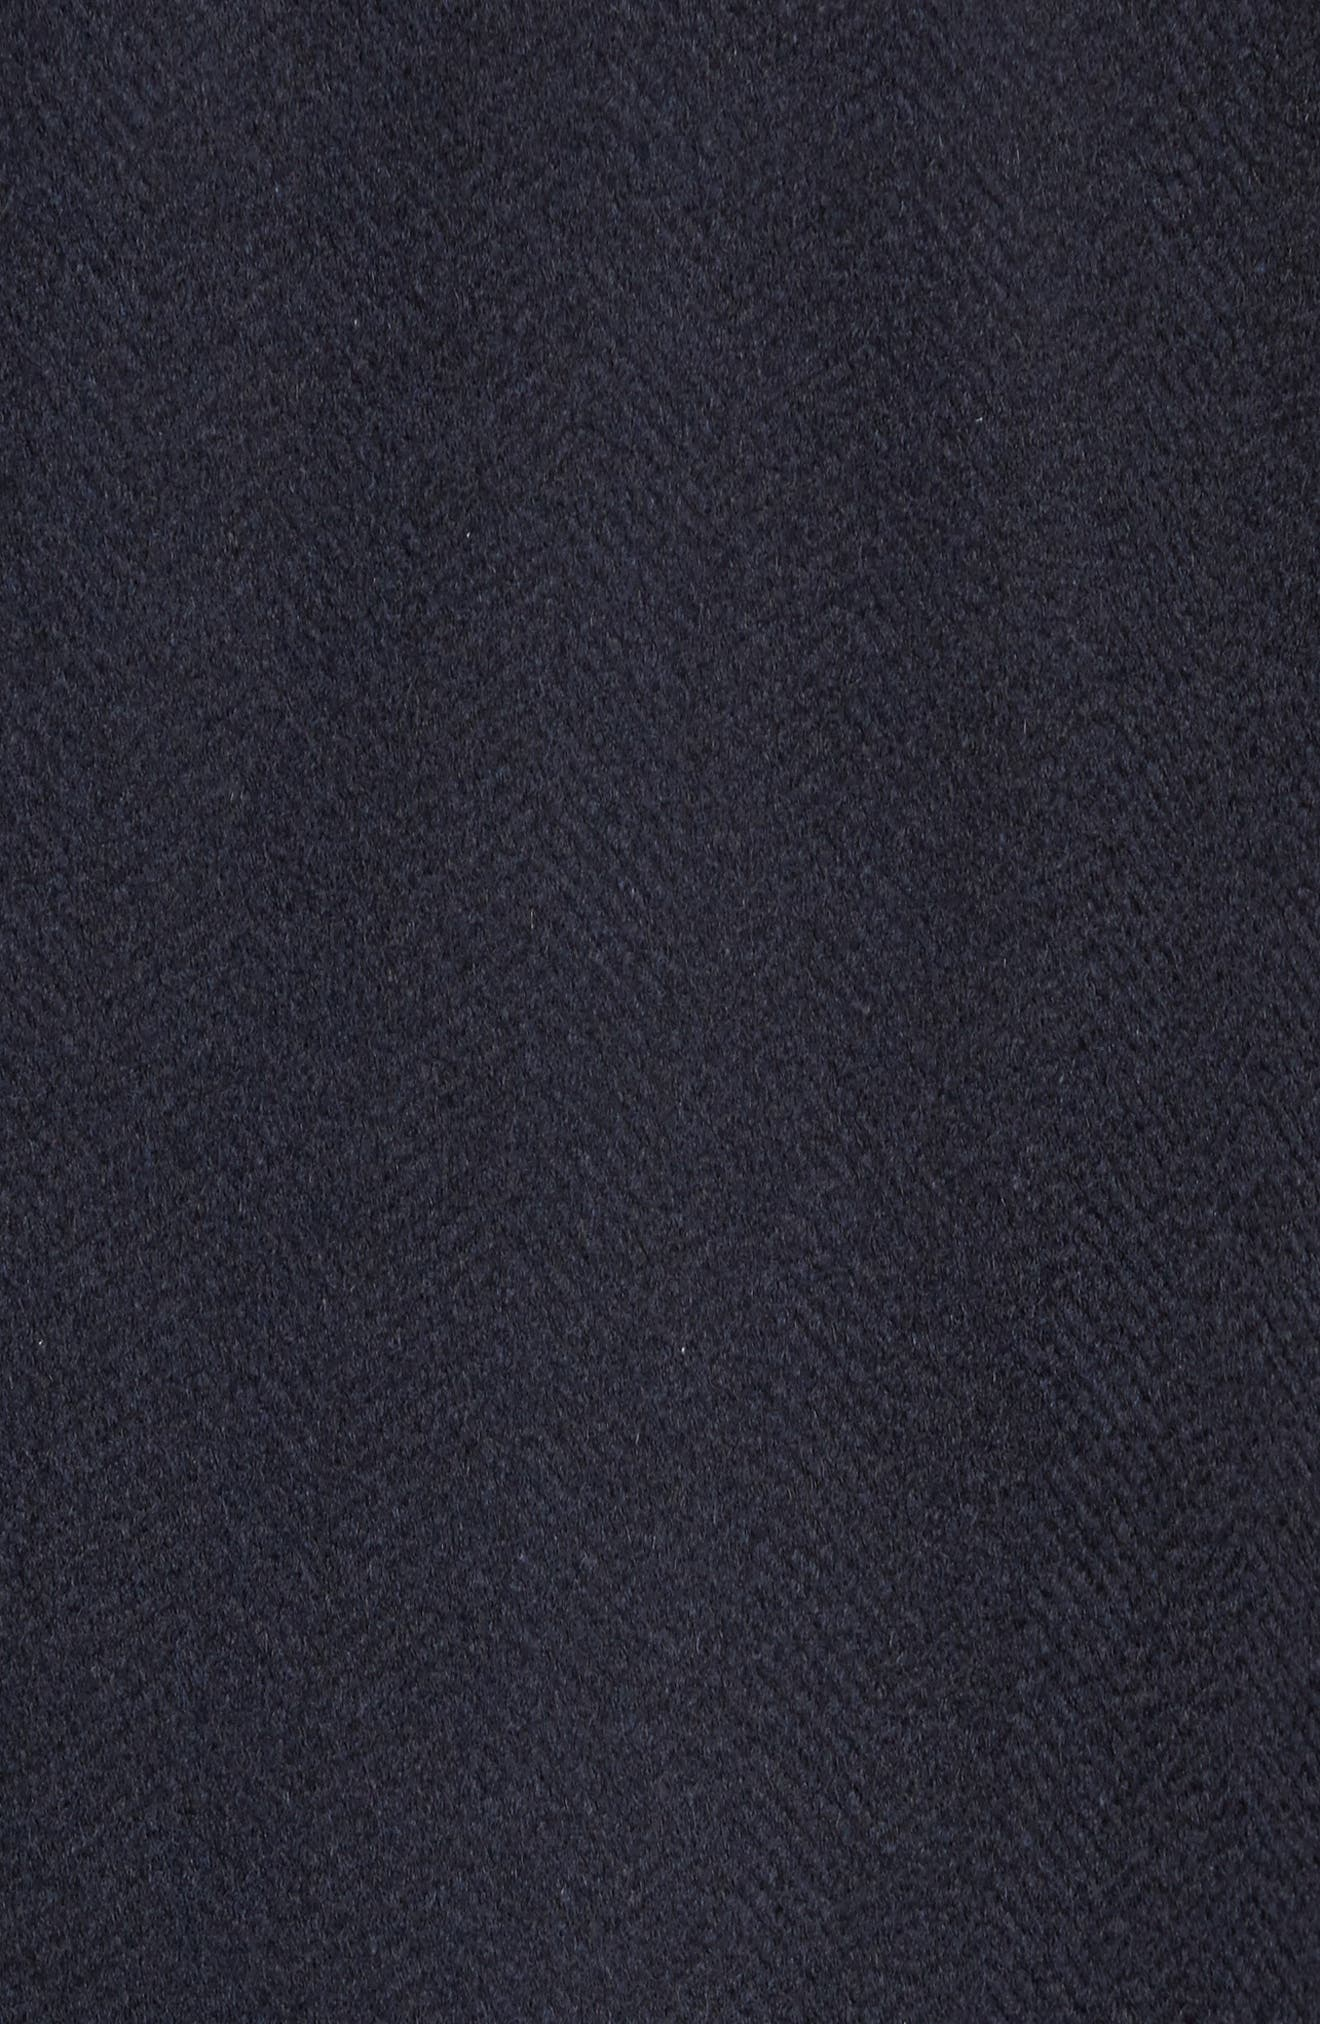 Culton Cashmere Overcoat,                             Alternate thumbnail 6, color,                             410